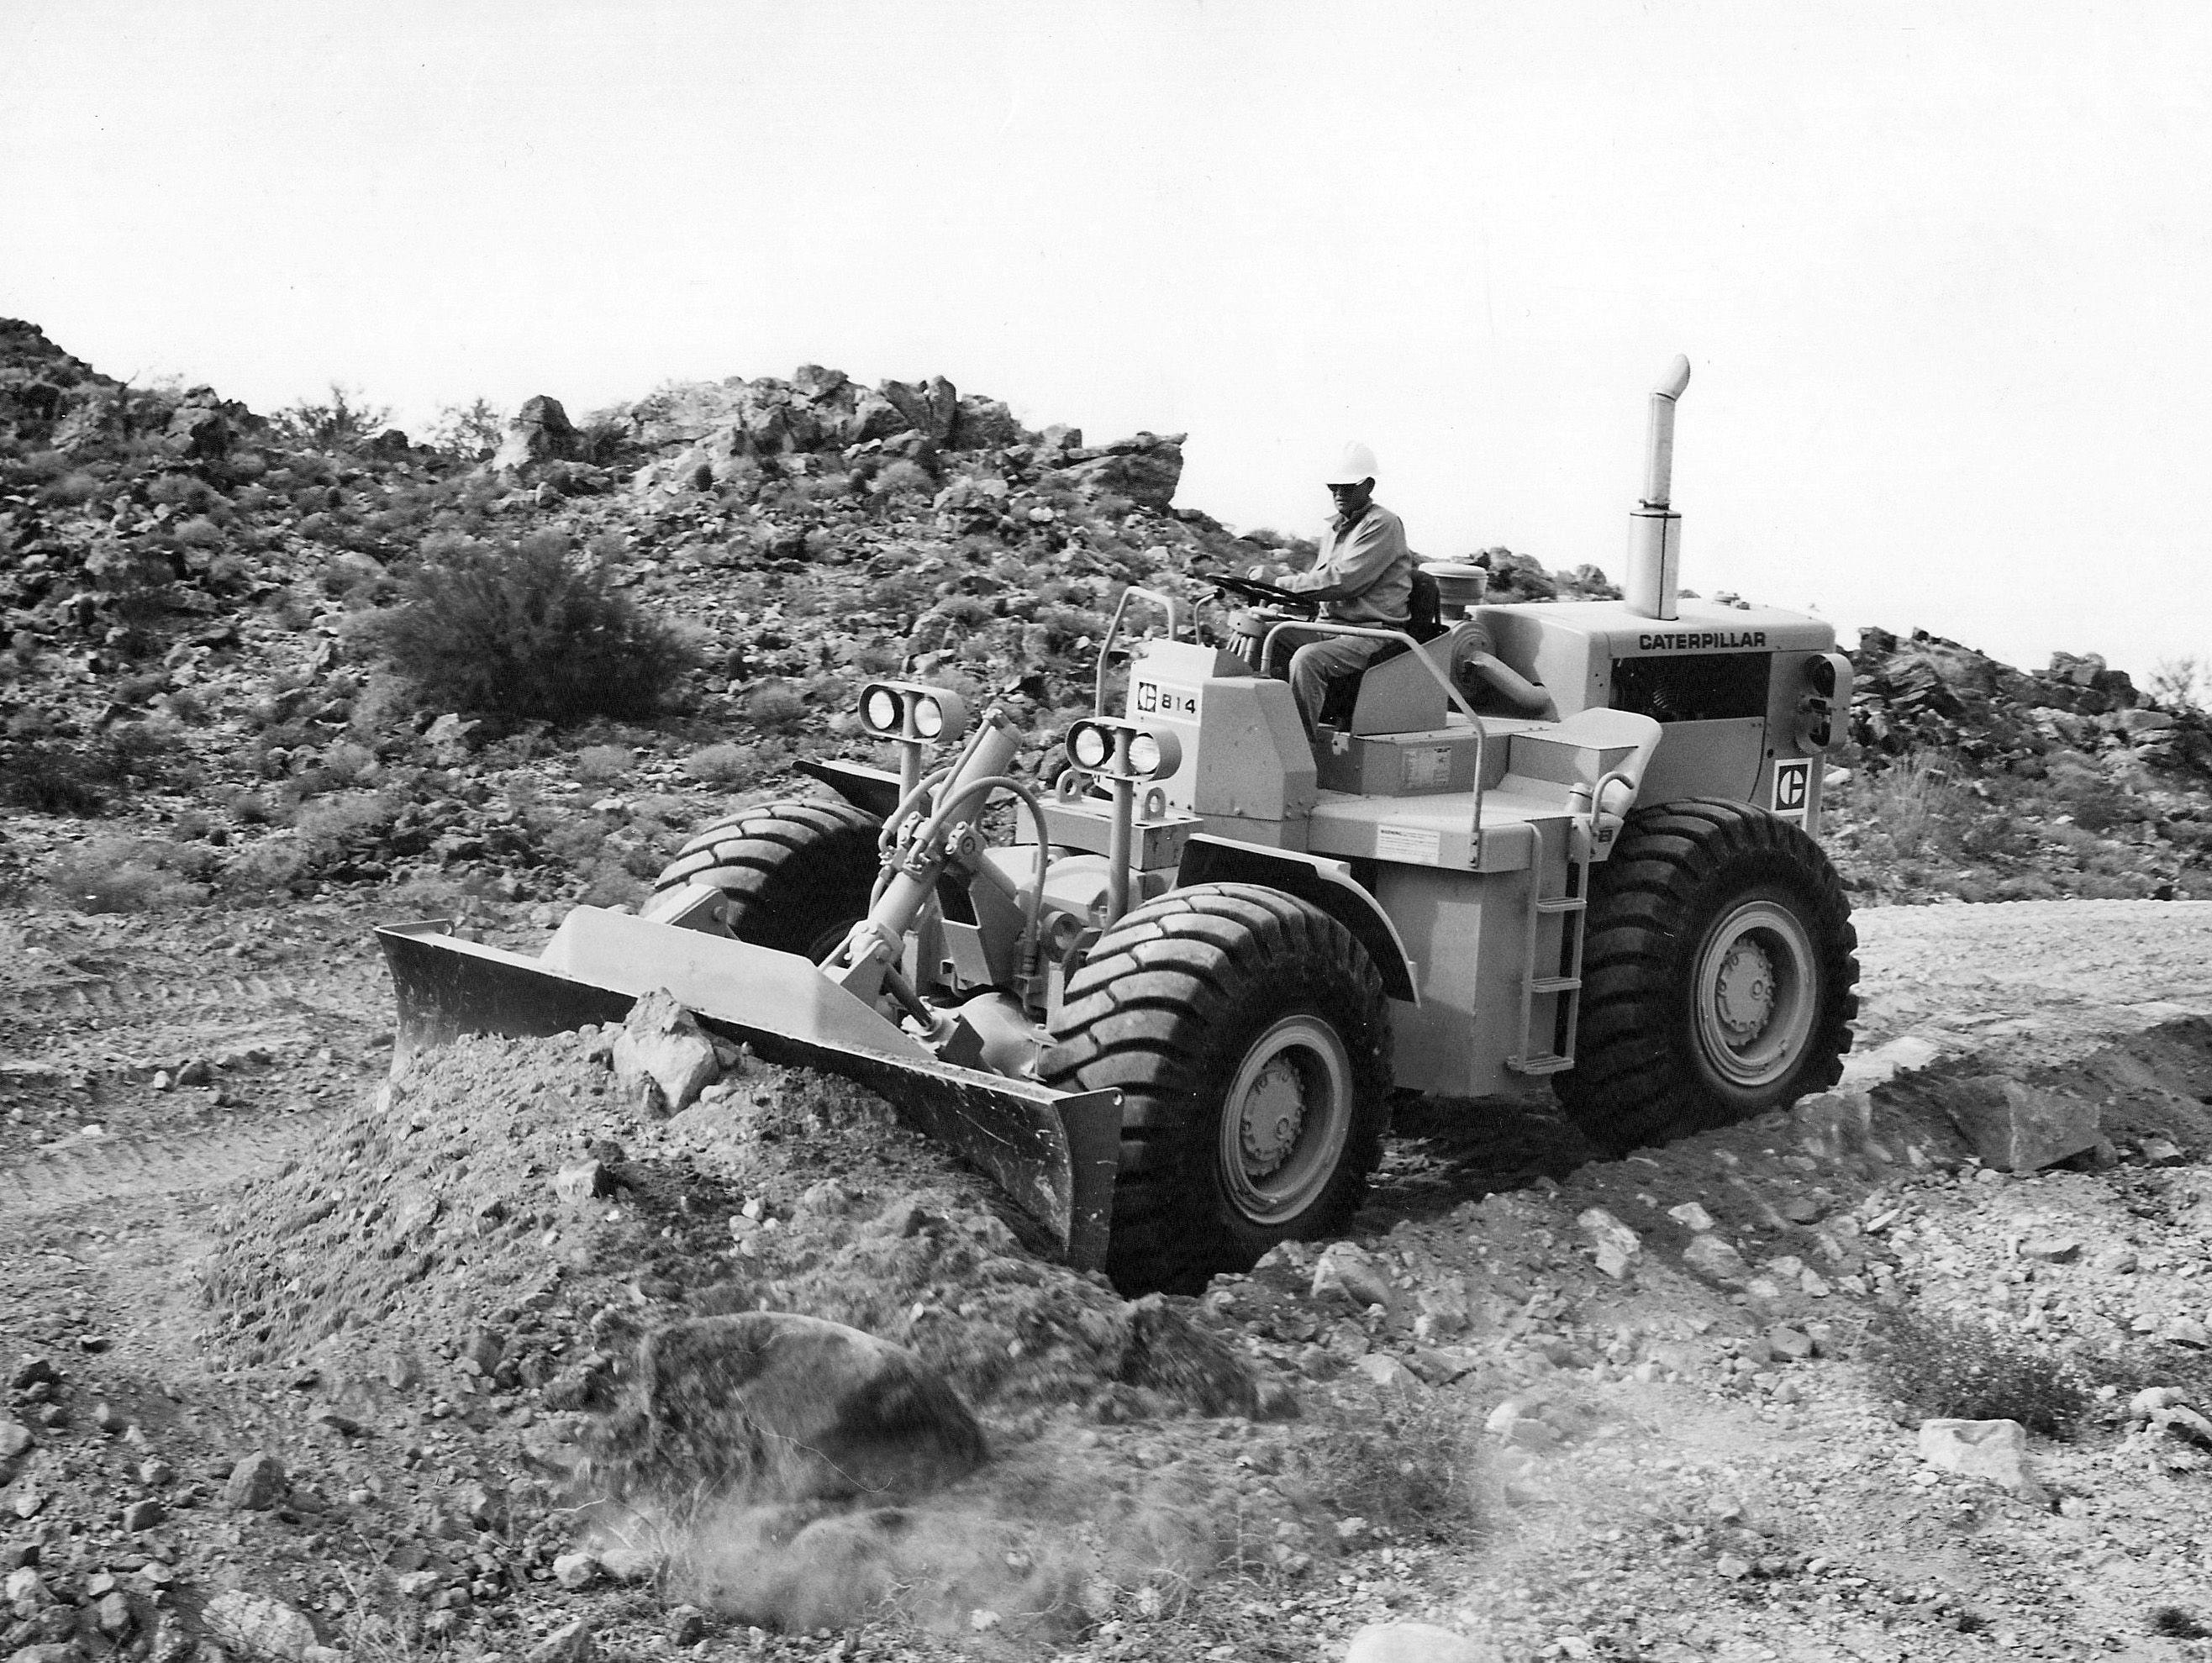 caterpillar-model-814-wheel-dozer-pit-quarry.jpg (2632×1979)